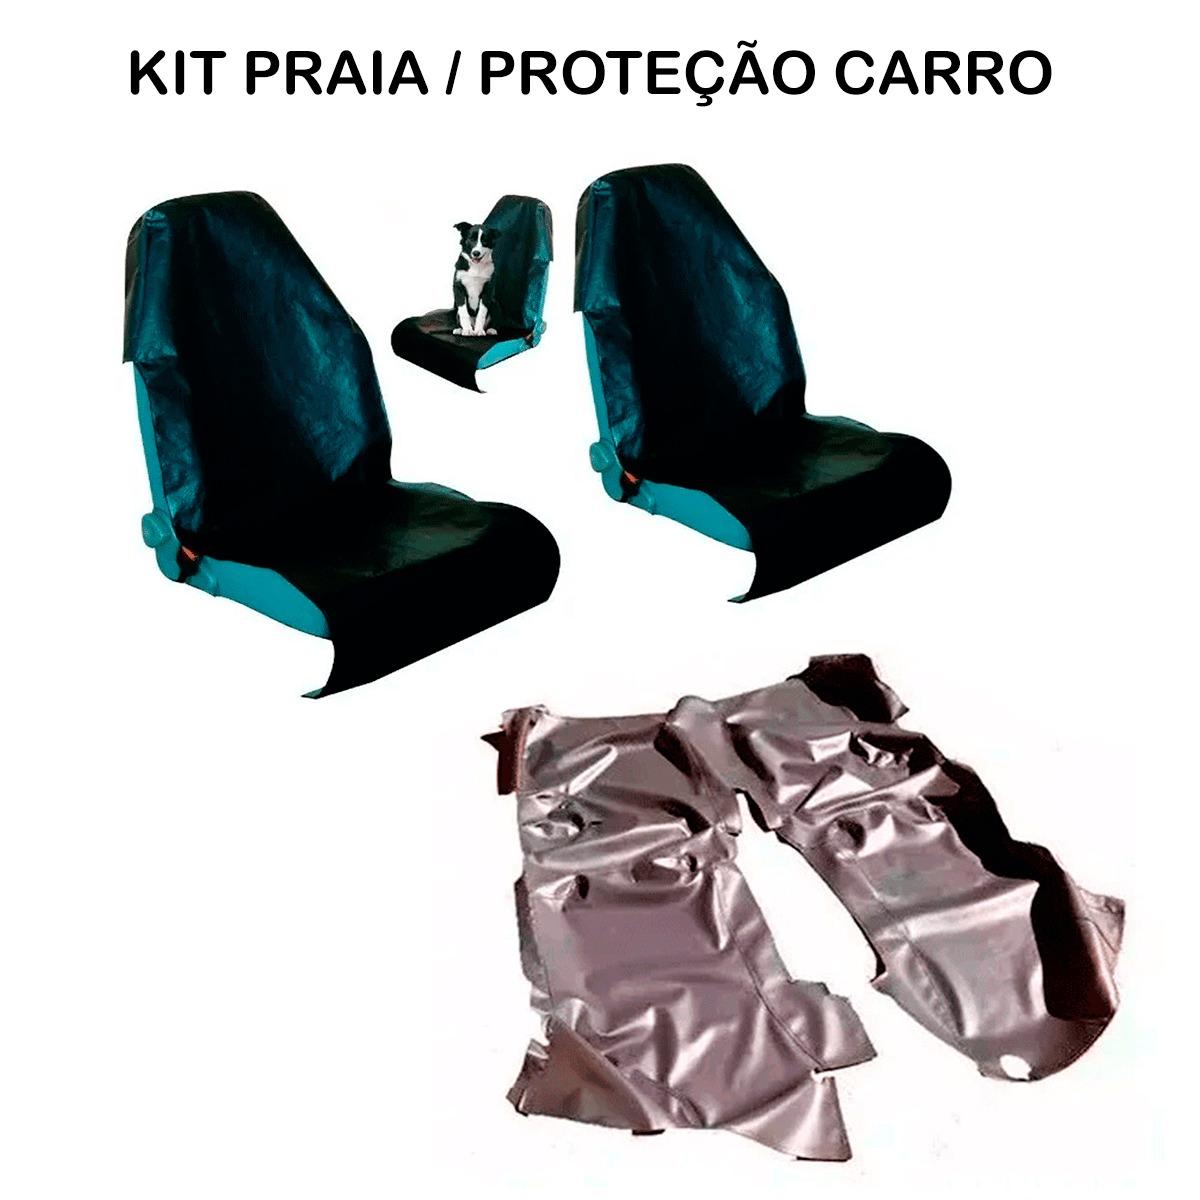 Tapete Em Vinil Volkswagen Saveiro Surf + Capa Banco Protecao Banco Areia Suor Academia